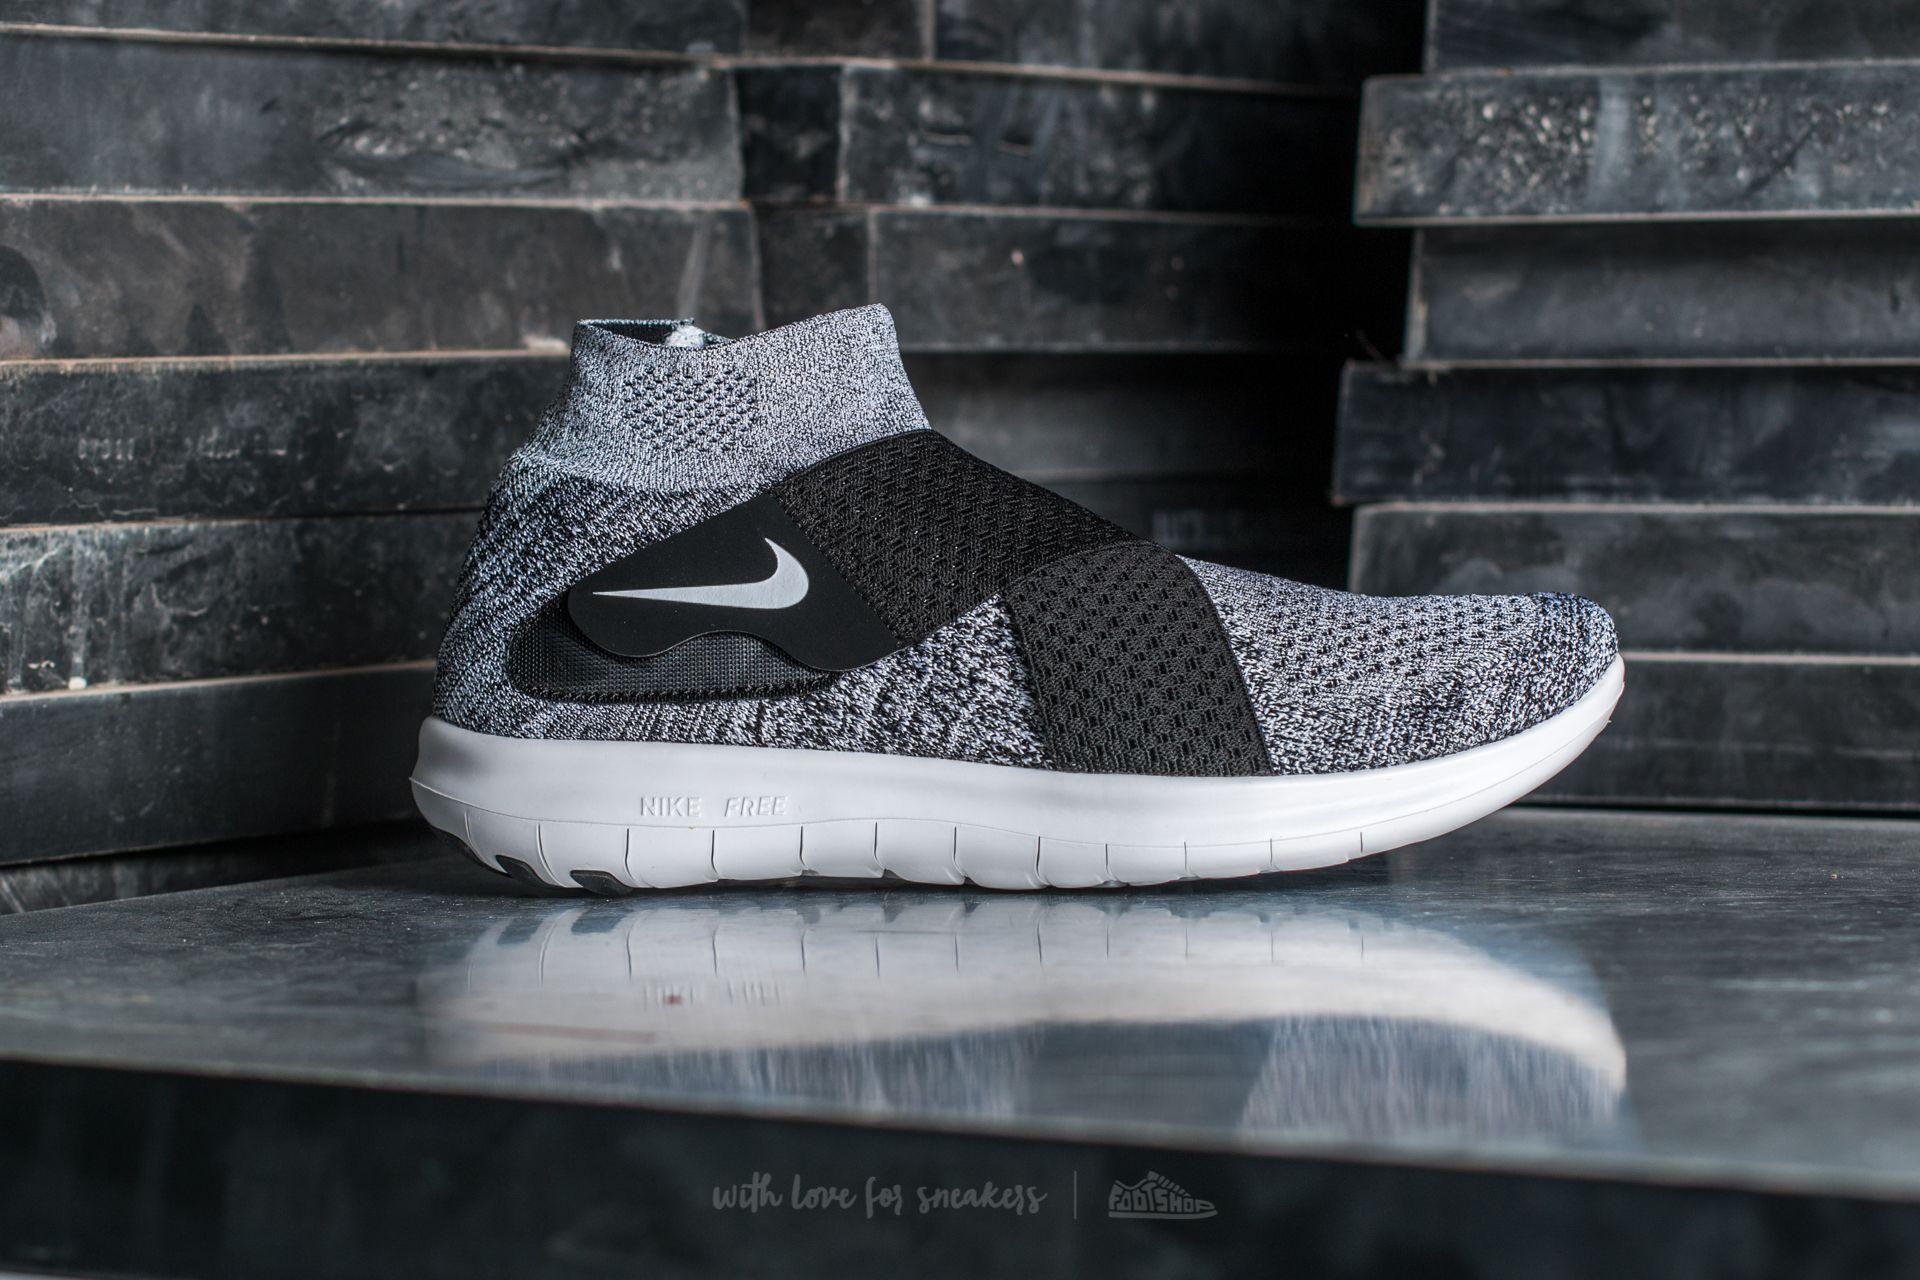 e15d8f33d24db Nike Free Run Motion Flyknit 2017 Black/ White-Pure Platinum | Footshop